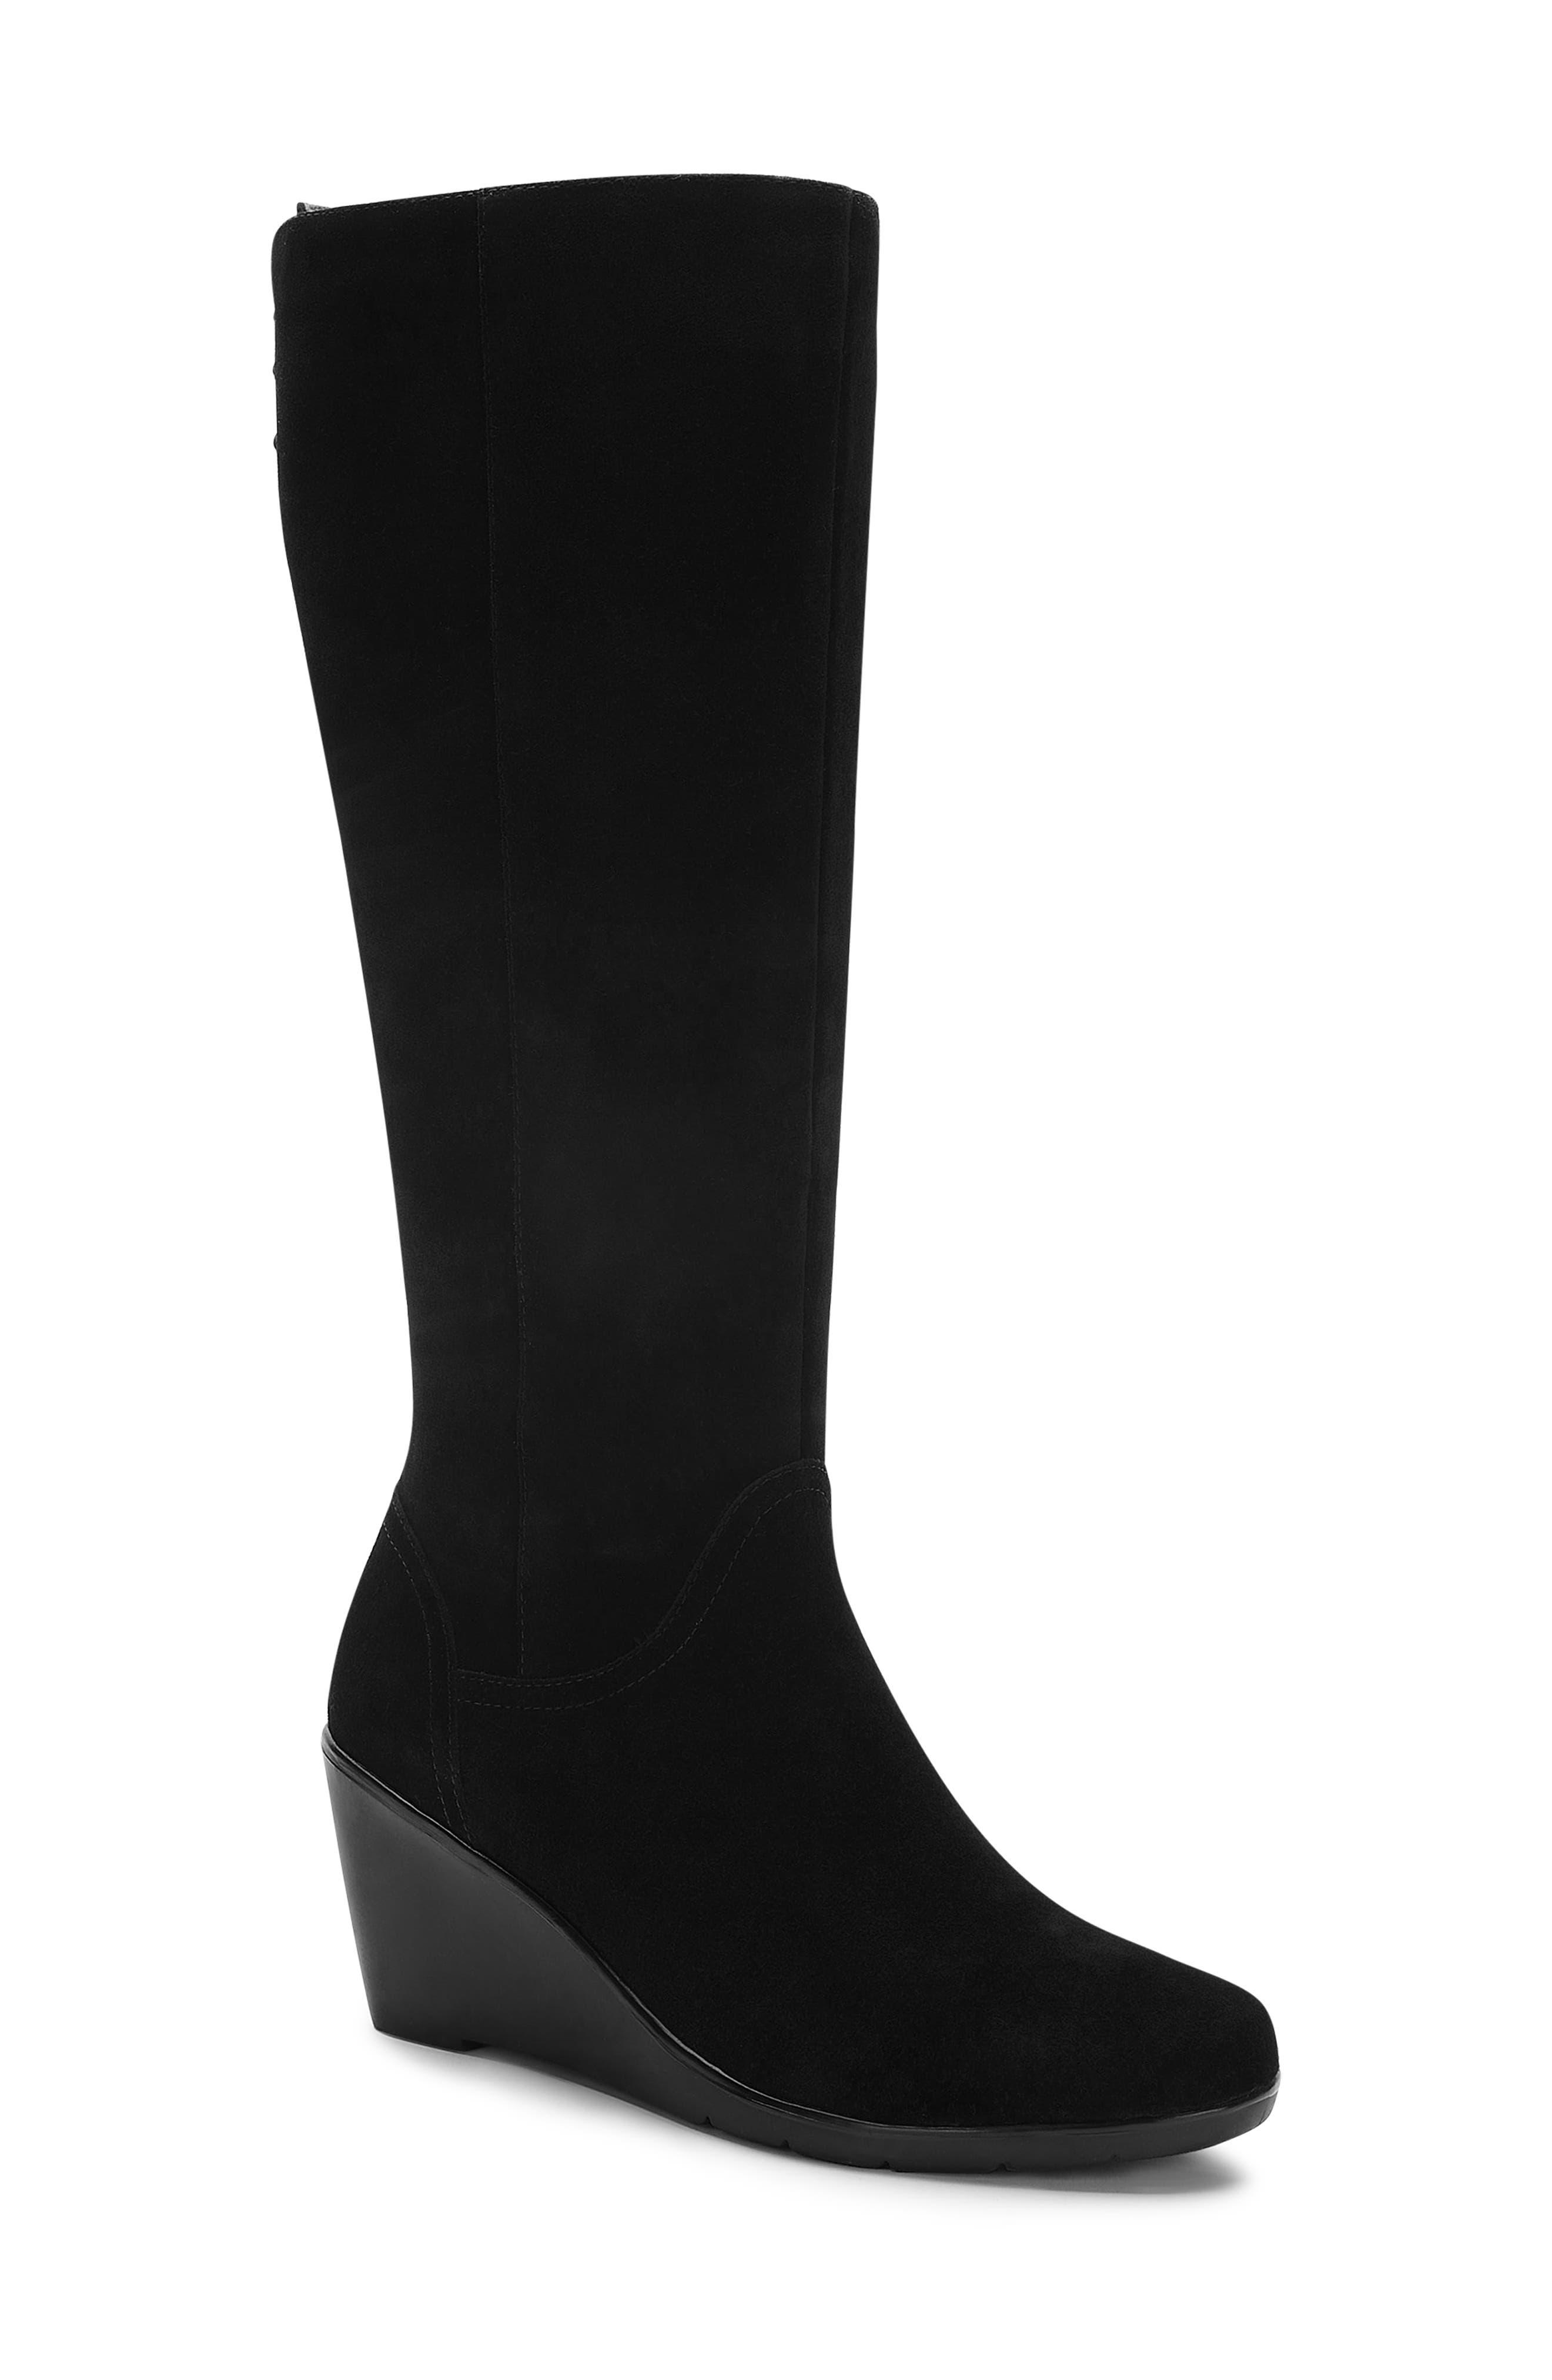 BLONDO Larissa Waterproof Wedge Knee High Boot, Main, color, BLACK SUEDE